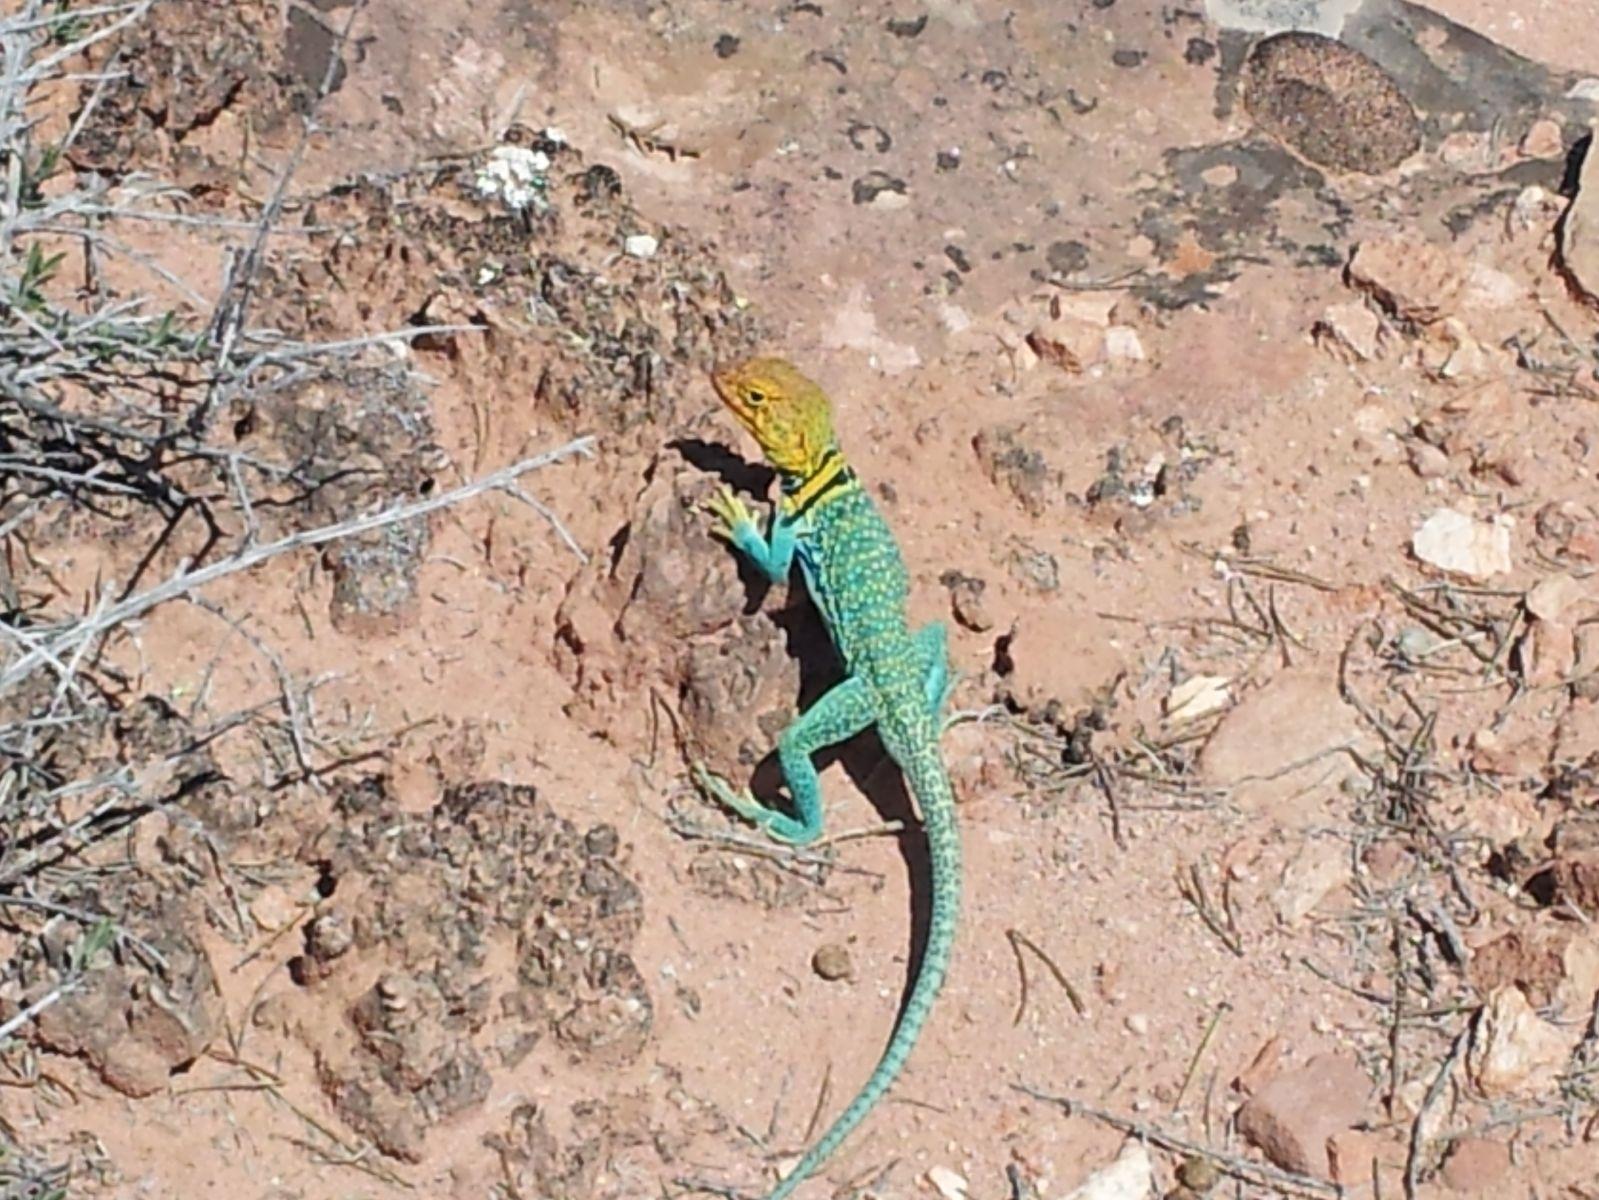 Colorful Lizard